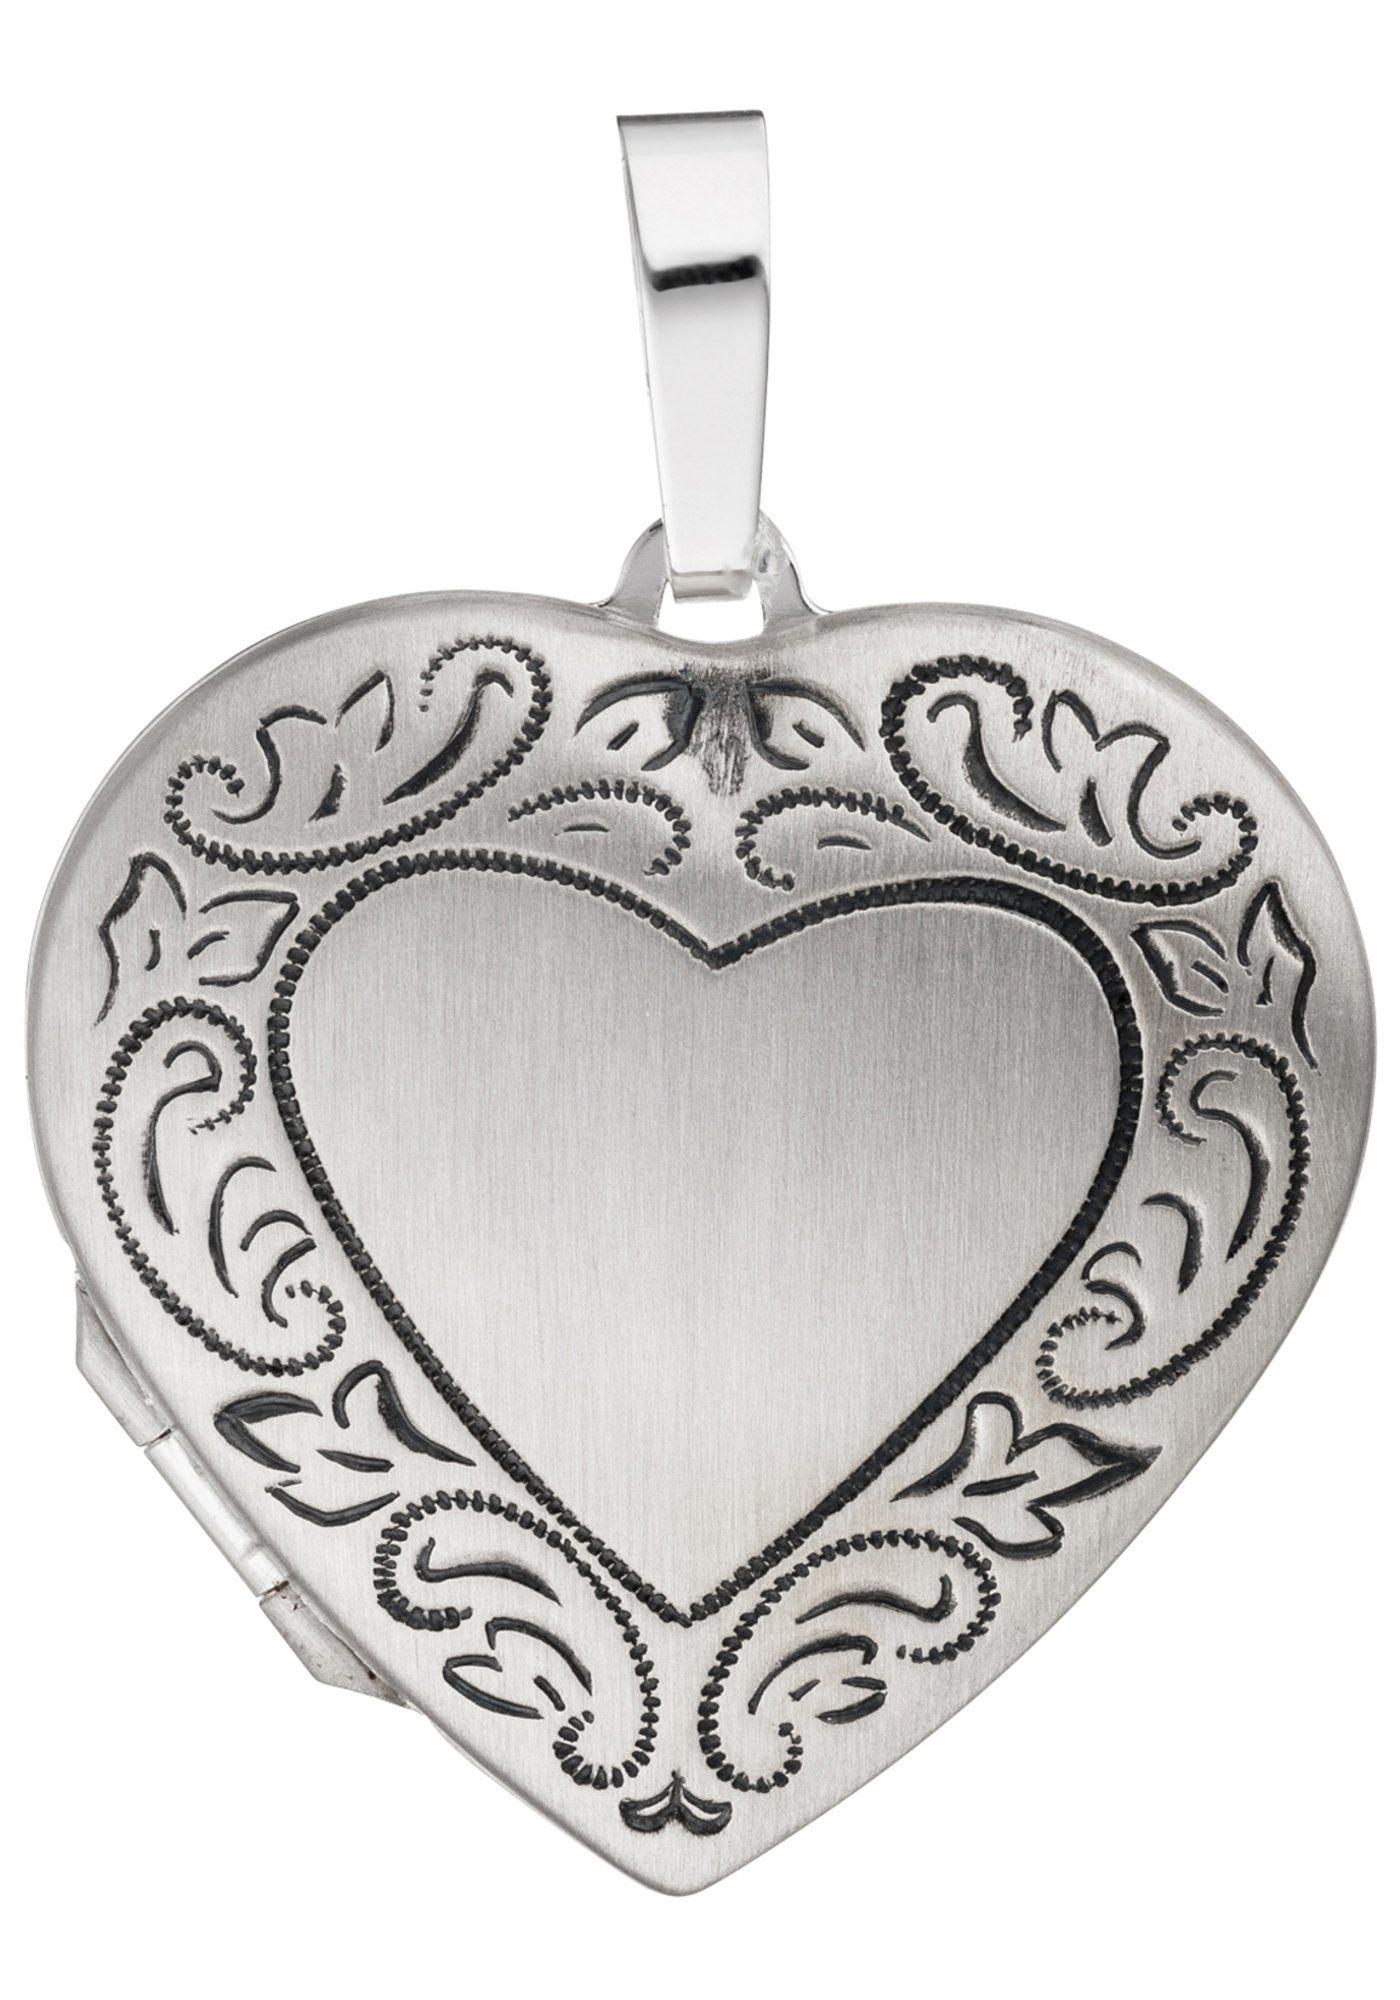 JOBO Medallionanhänger Herz 925 Silber